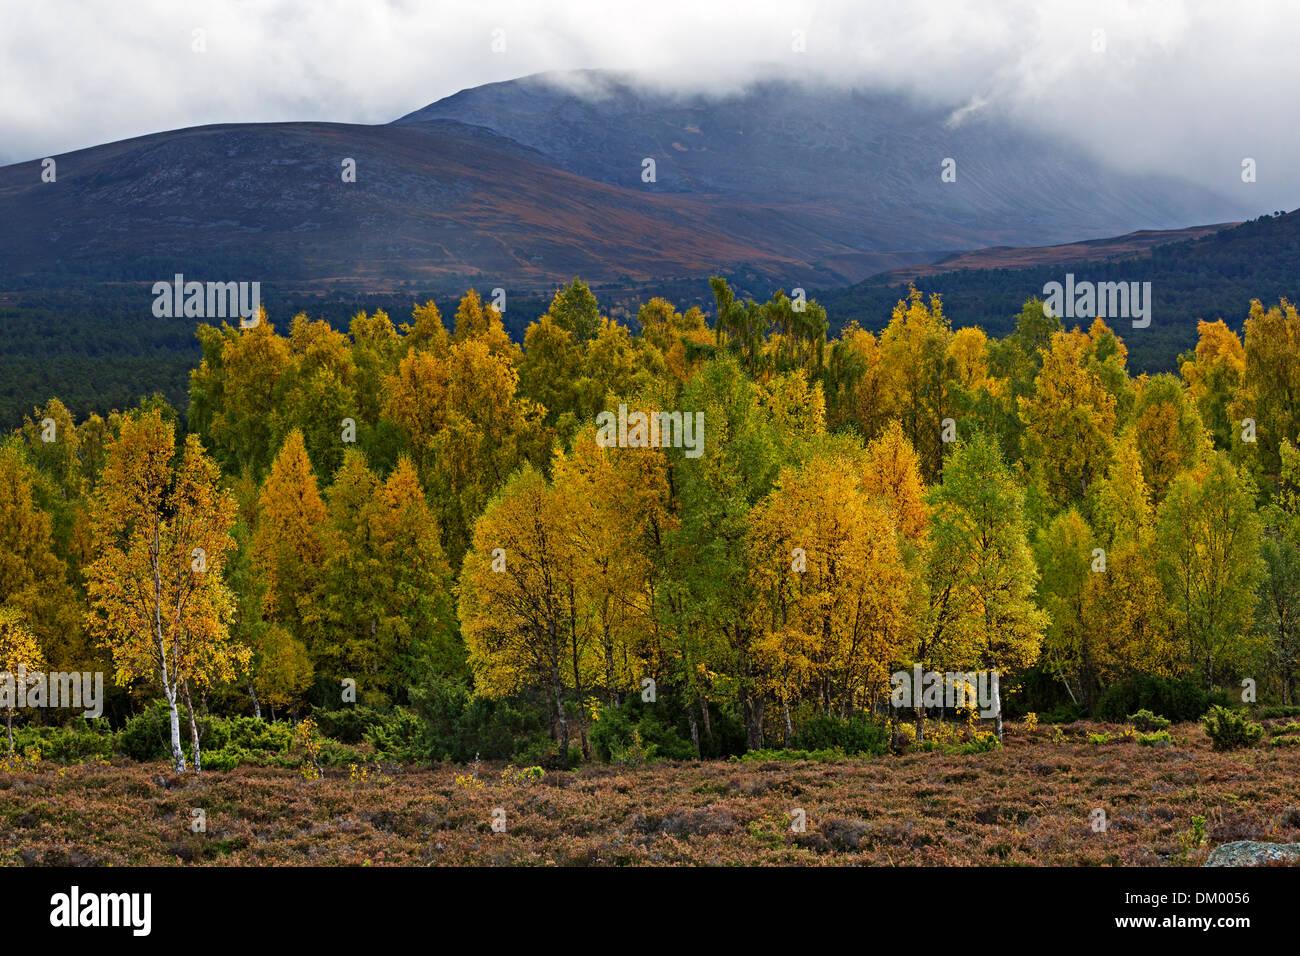 Rothiemurchus Forest in autumn, Cairngorms, Scottish Highlands - Stock Image